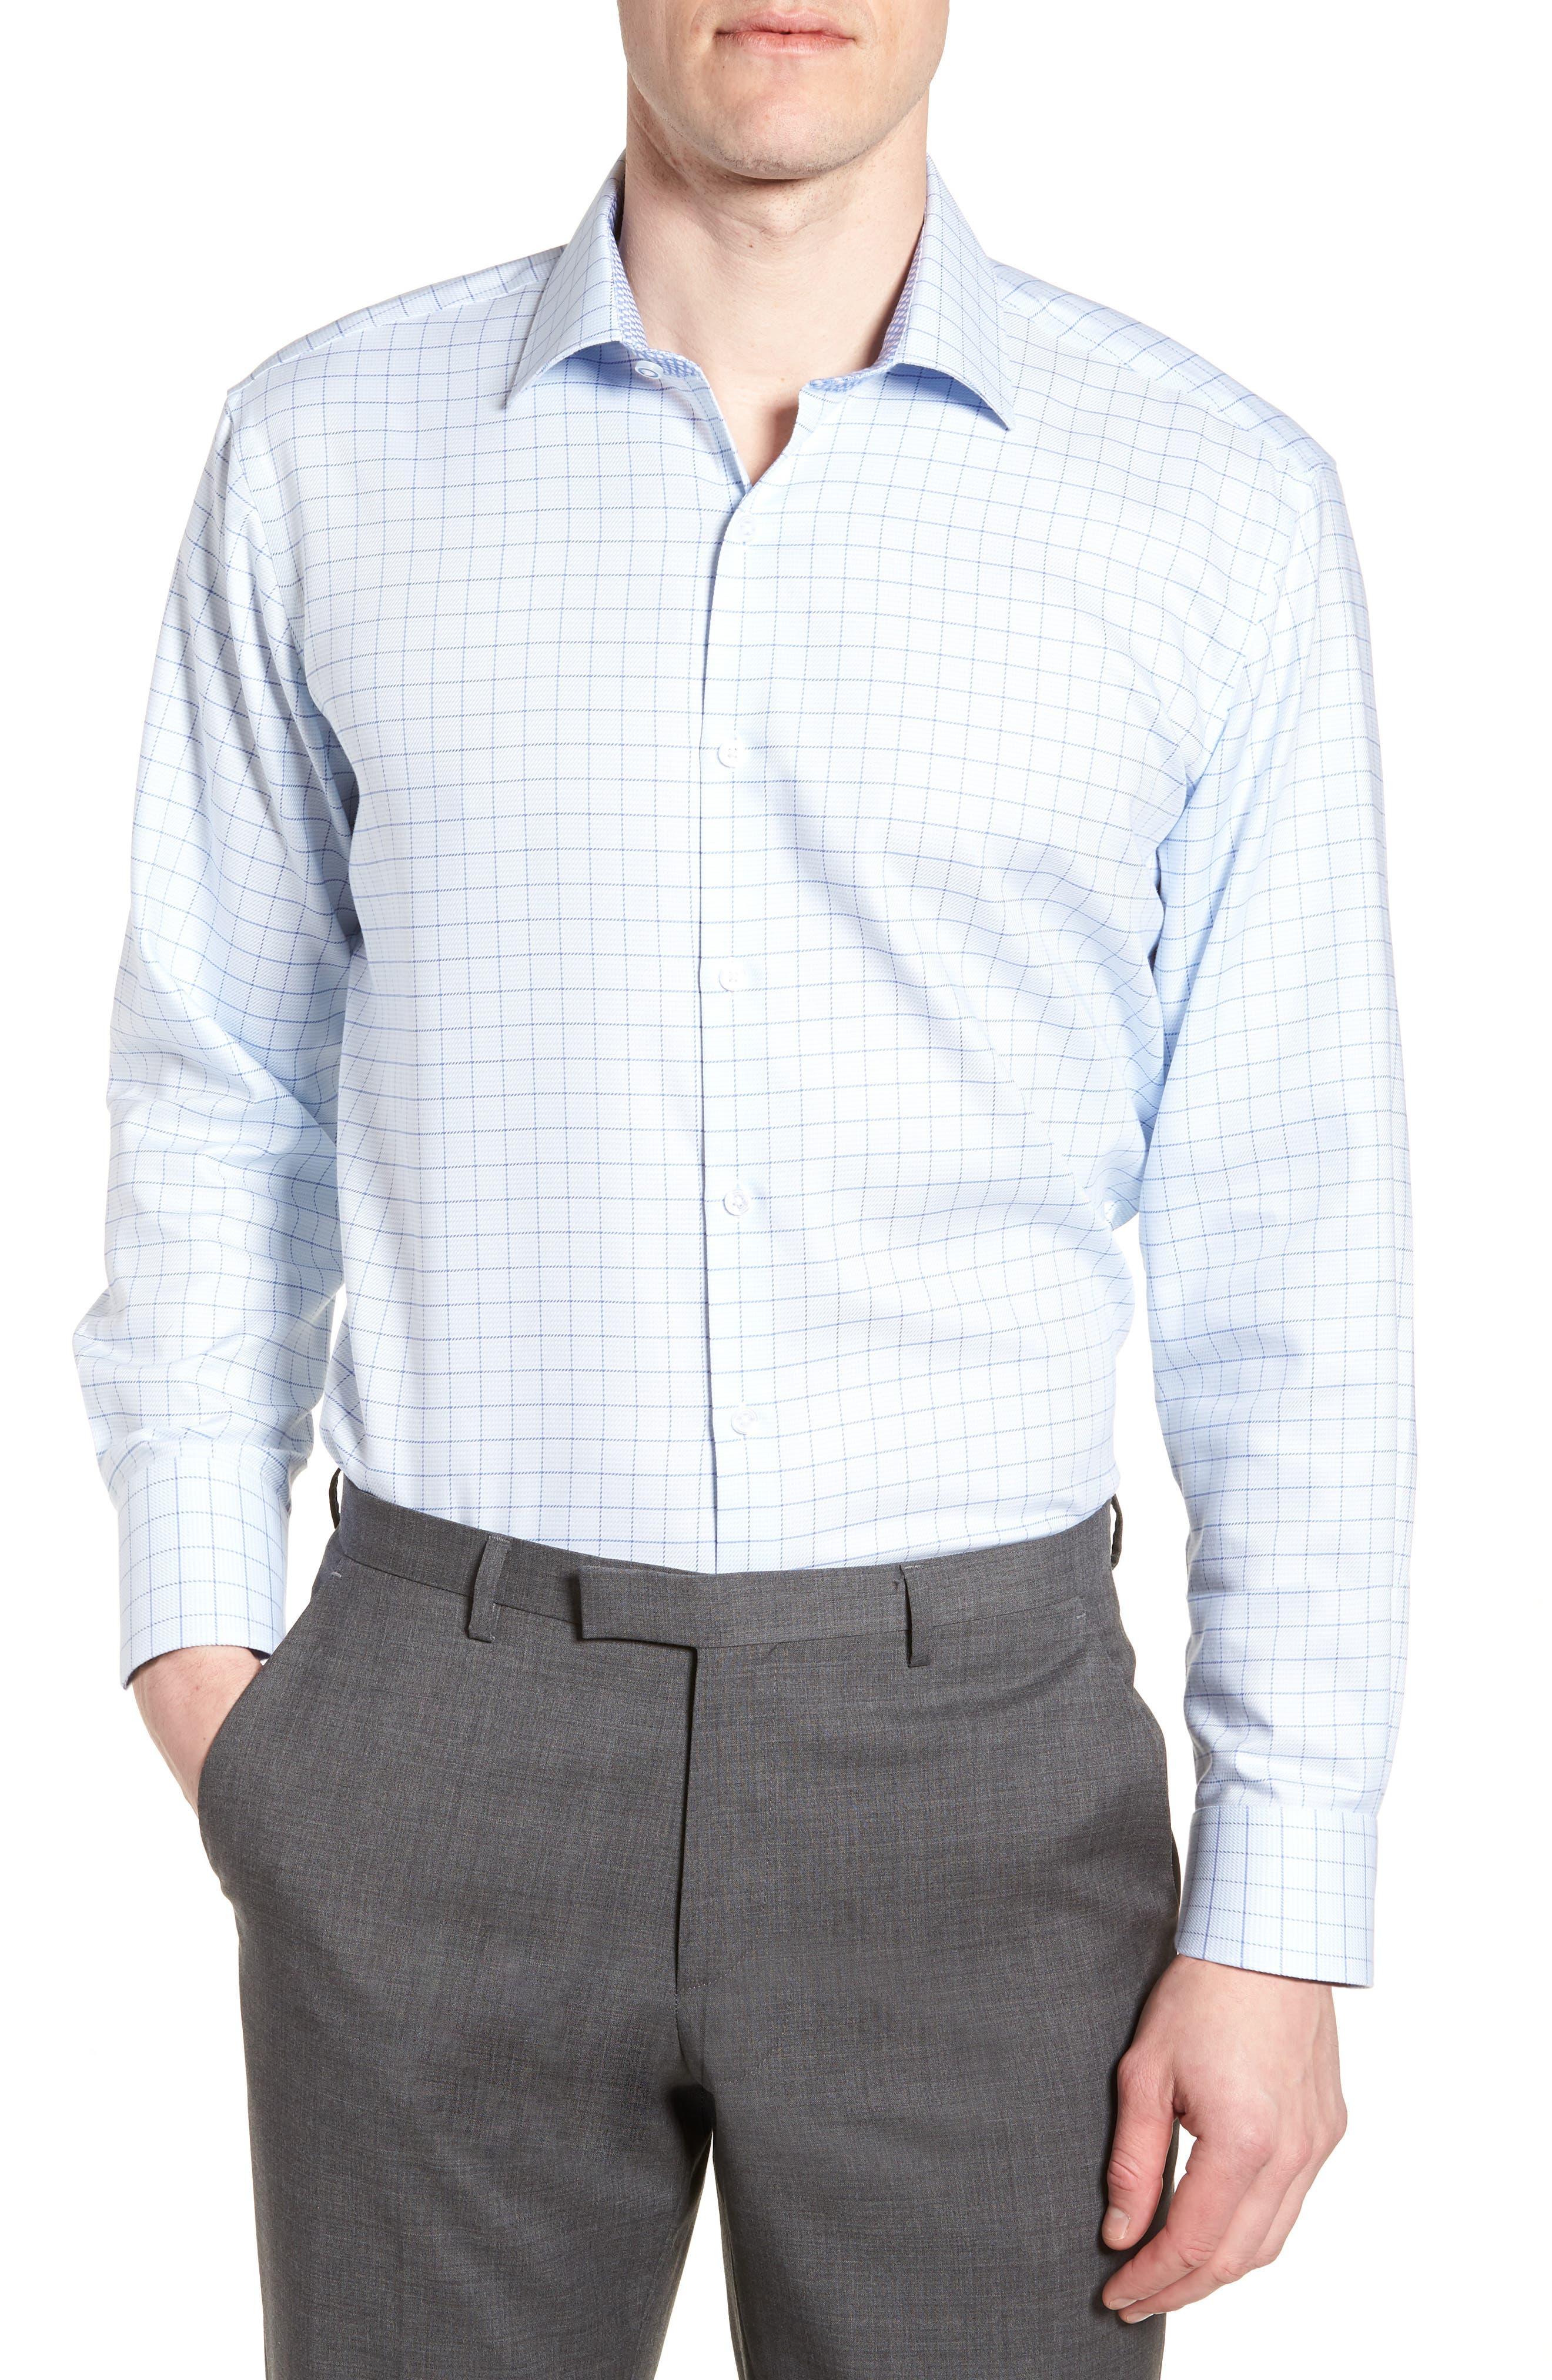 Alec Trim Fit Check Dress Shirt,                         Main,                         color, Light Blue